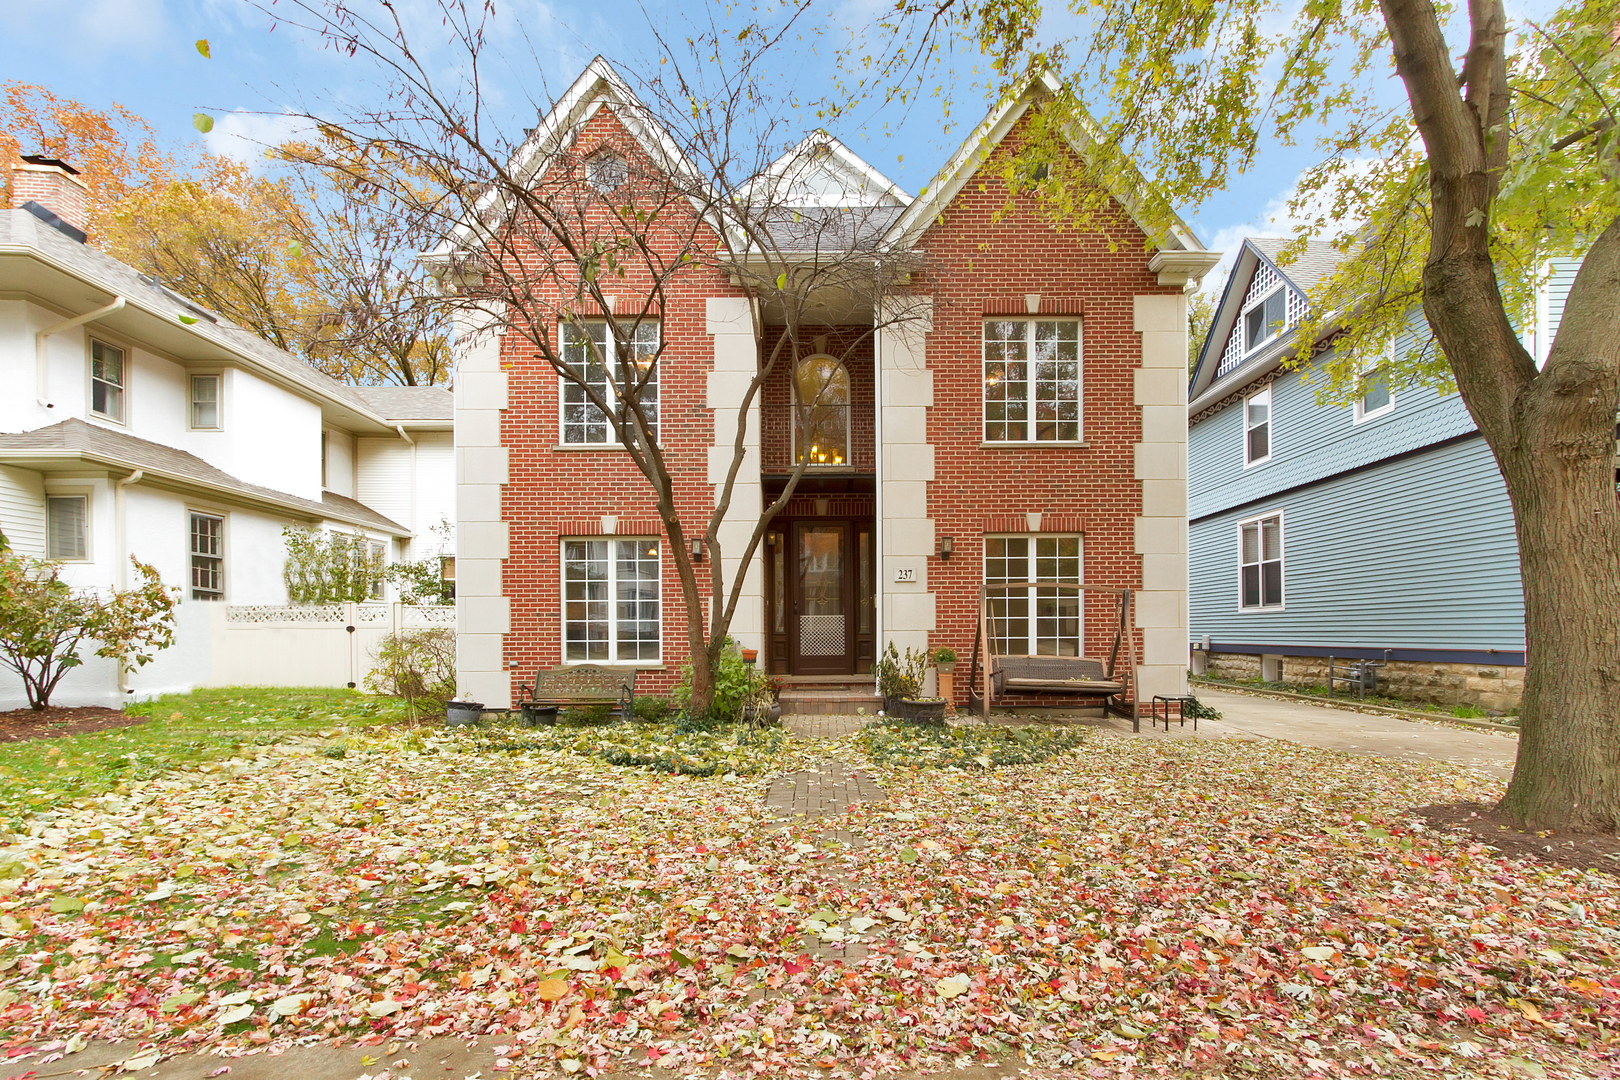 237 South Catherine Avenue, La Grange, Illinois